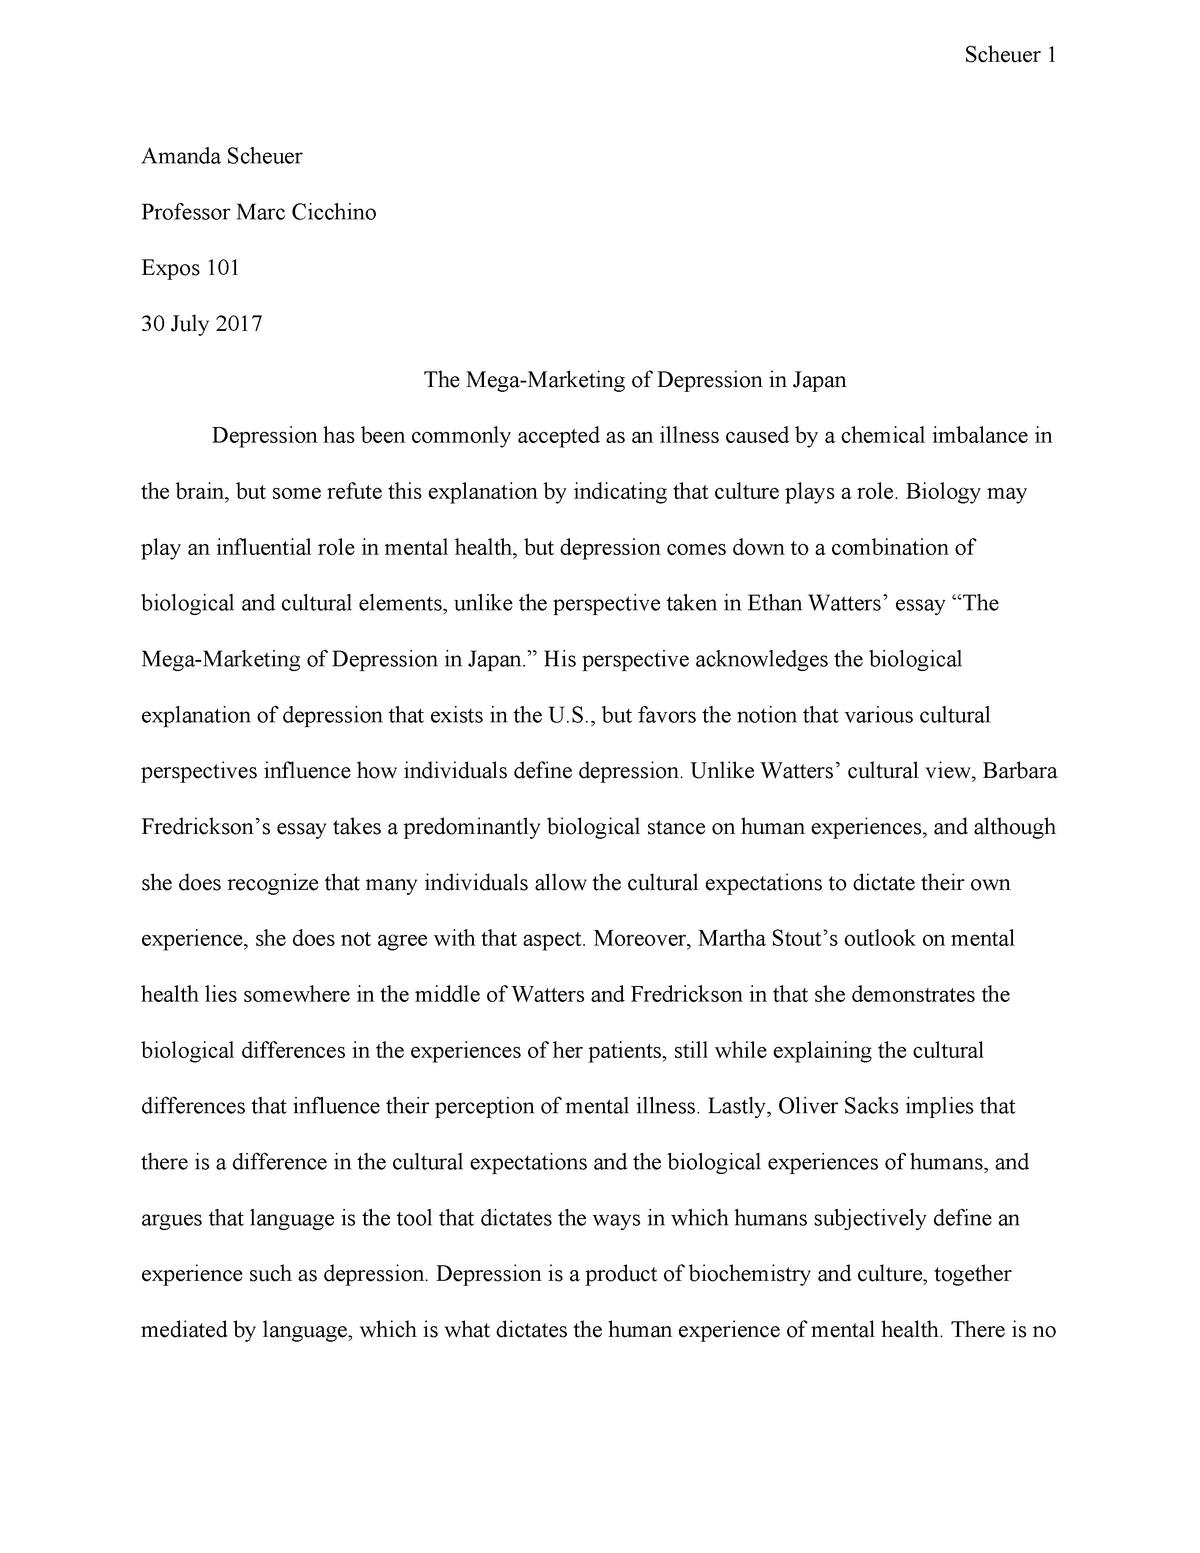 Dissertation writing and depression